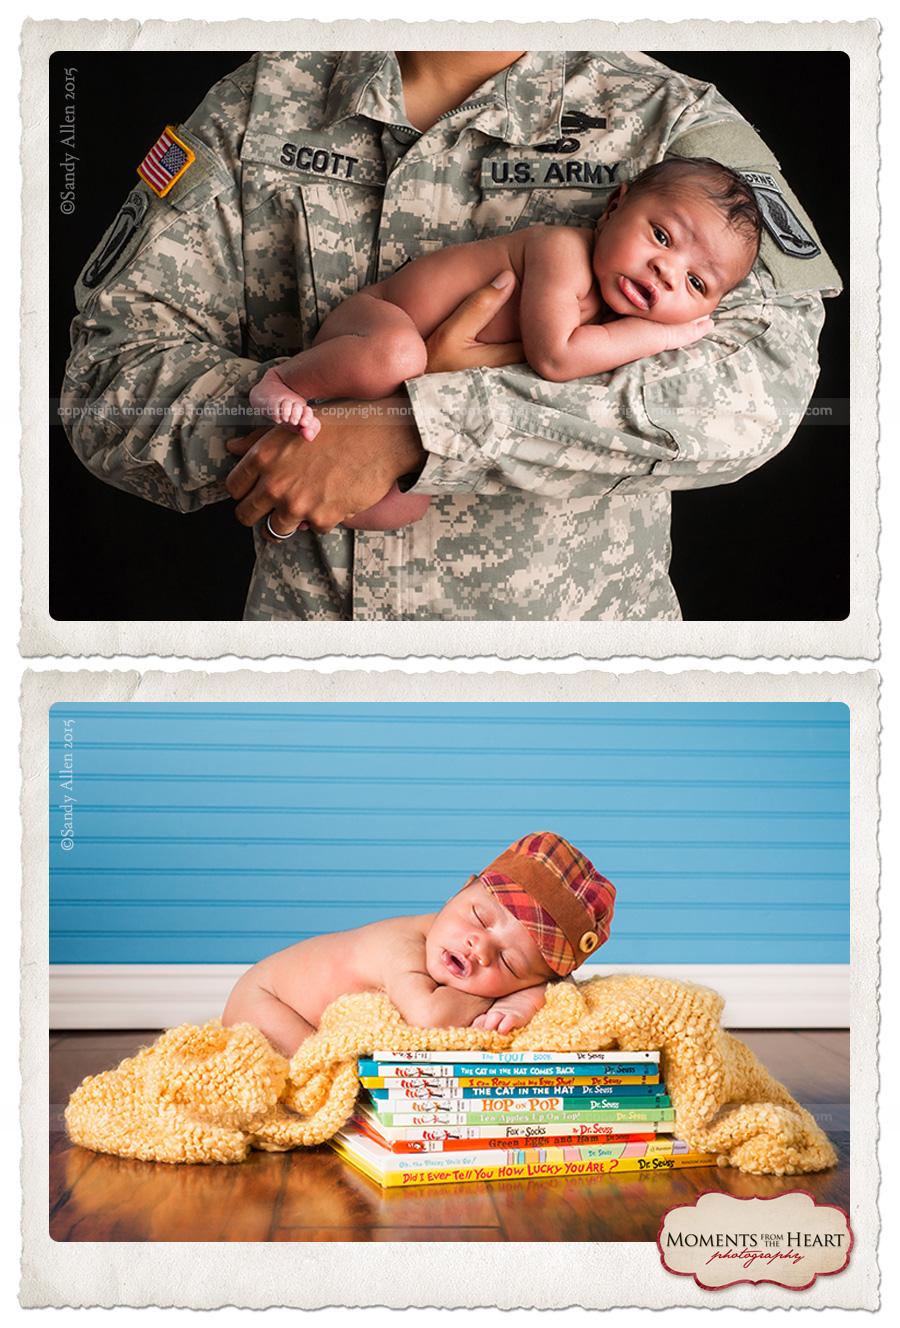 proud soldier holding newborn son